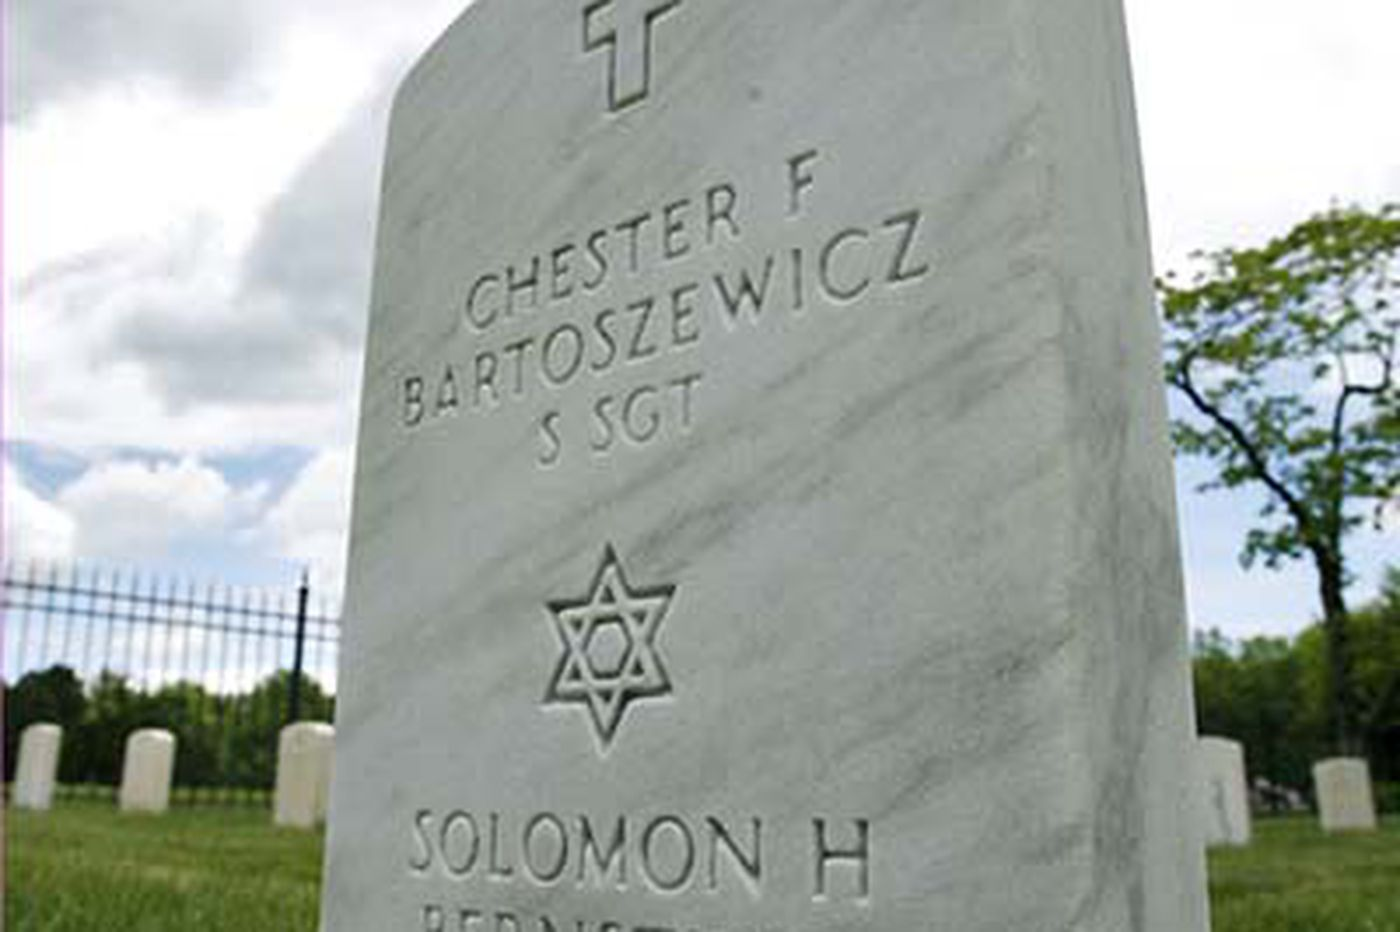 A 'unique' honor for 2 war dead